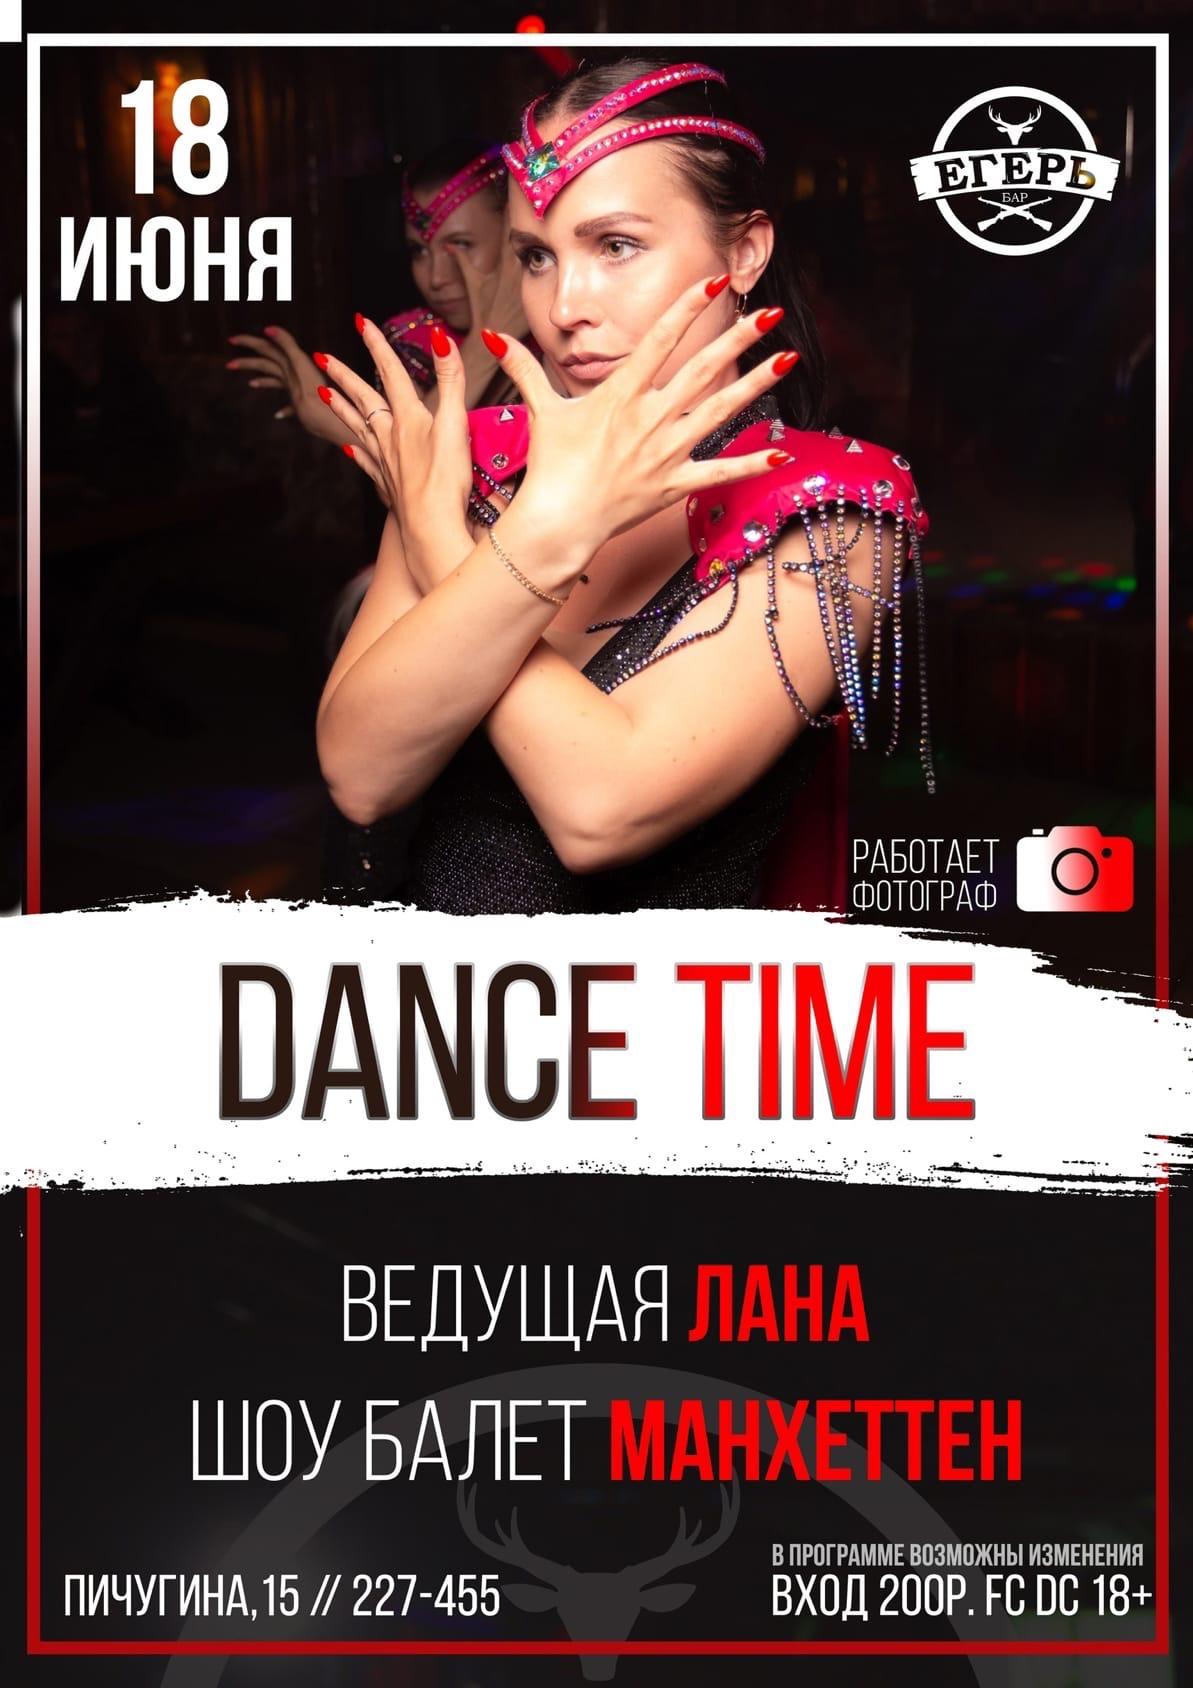 Dance time курган афиша расписание